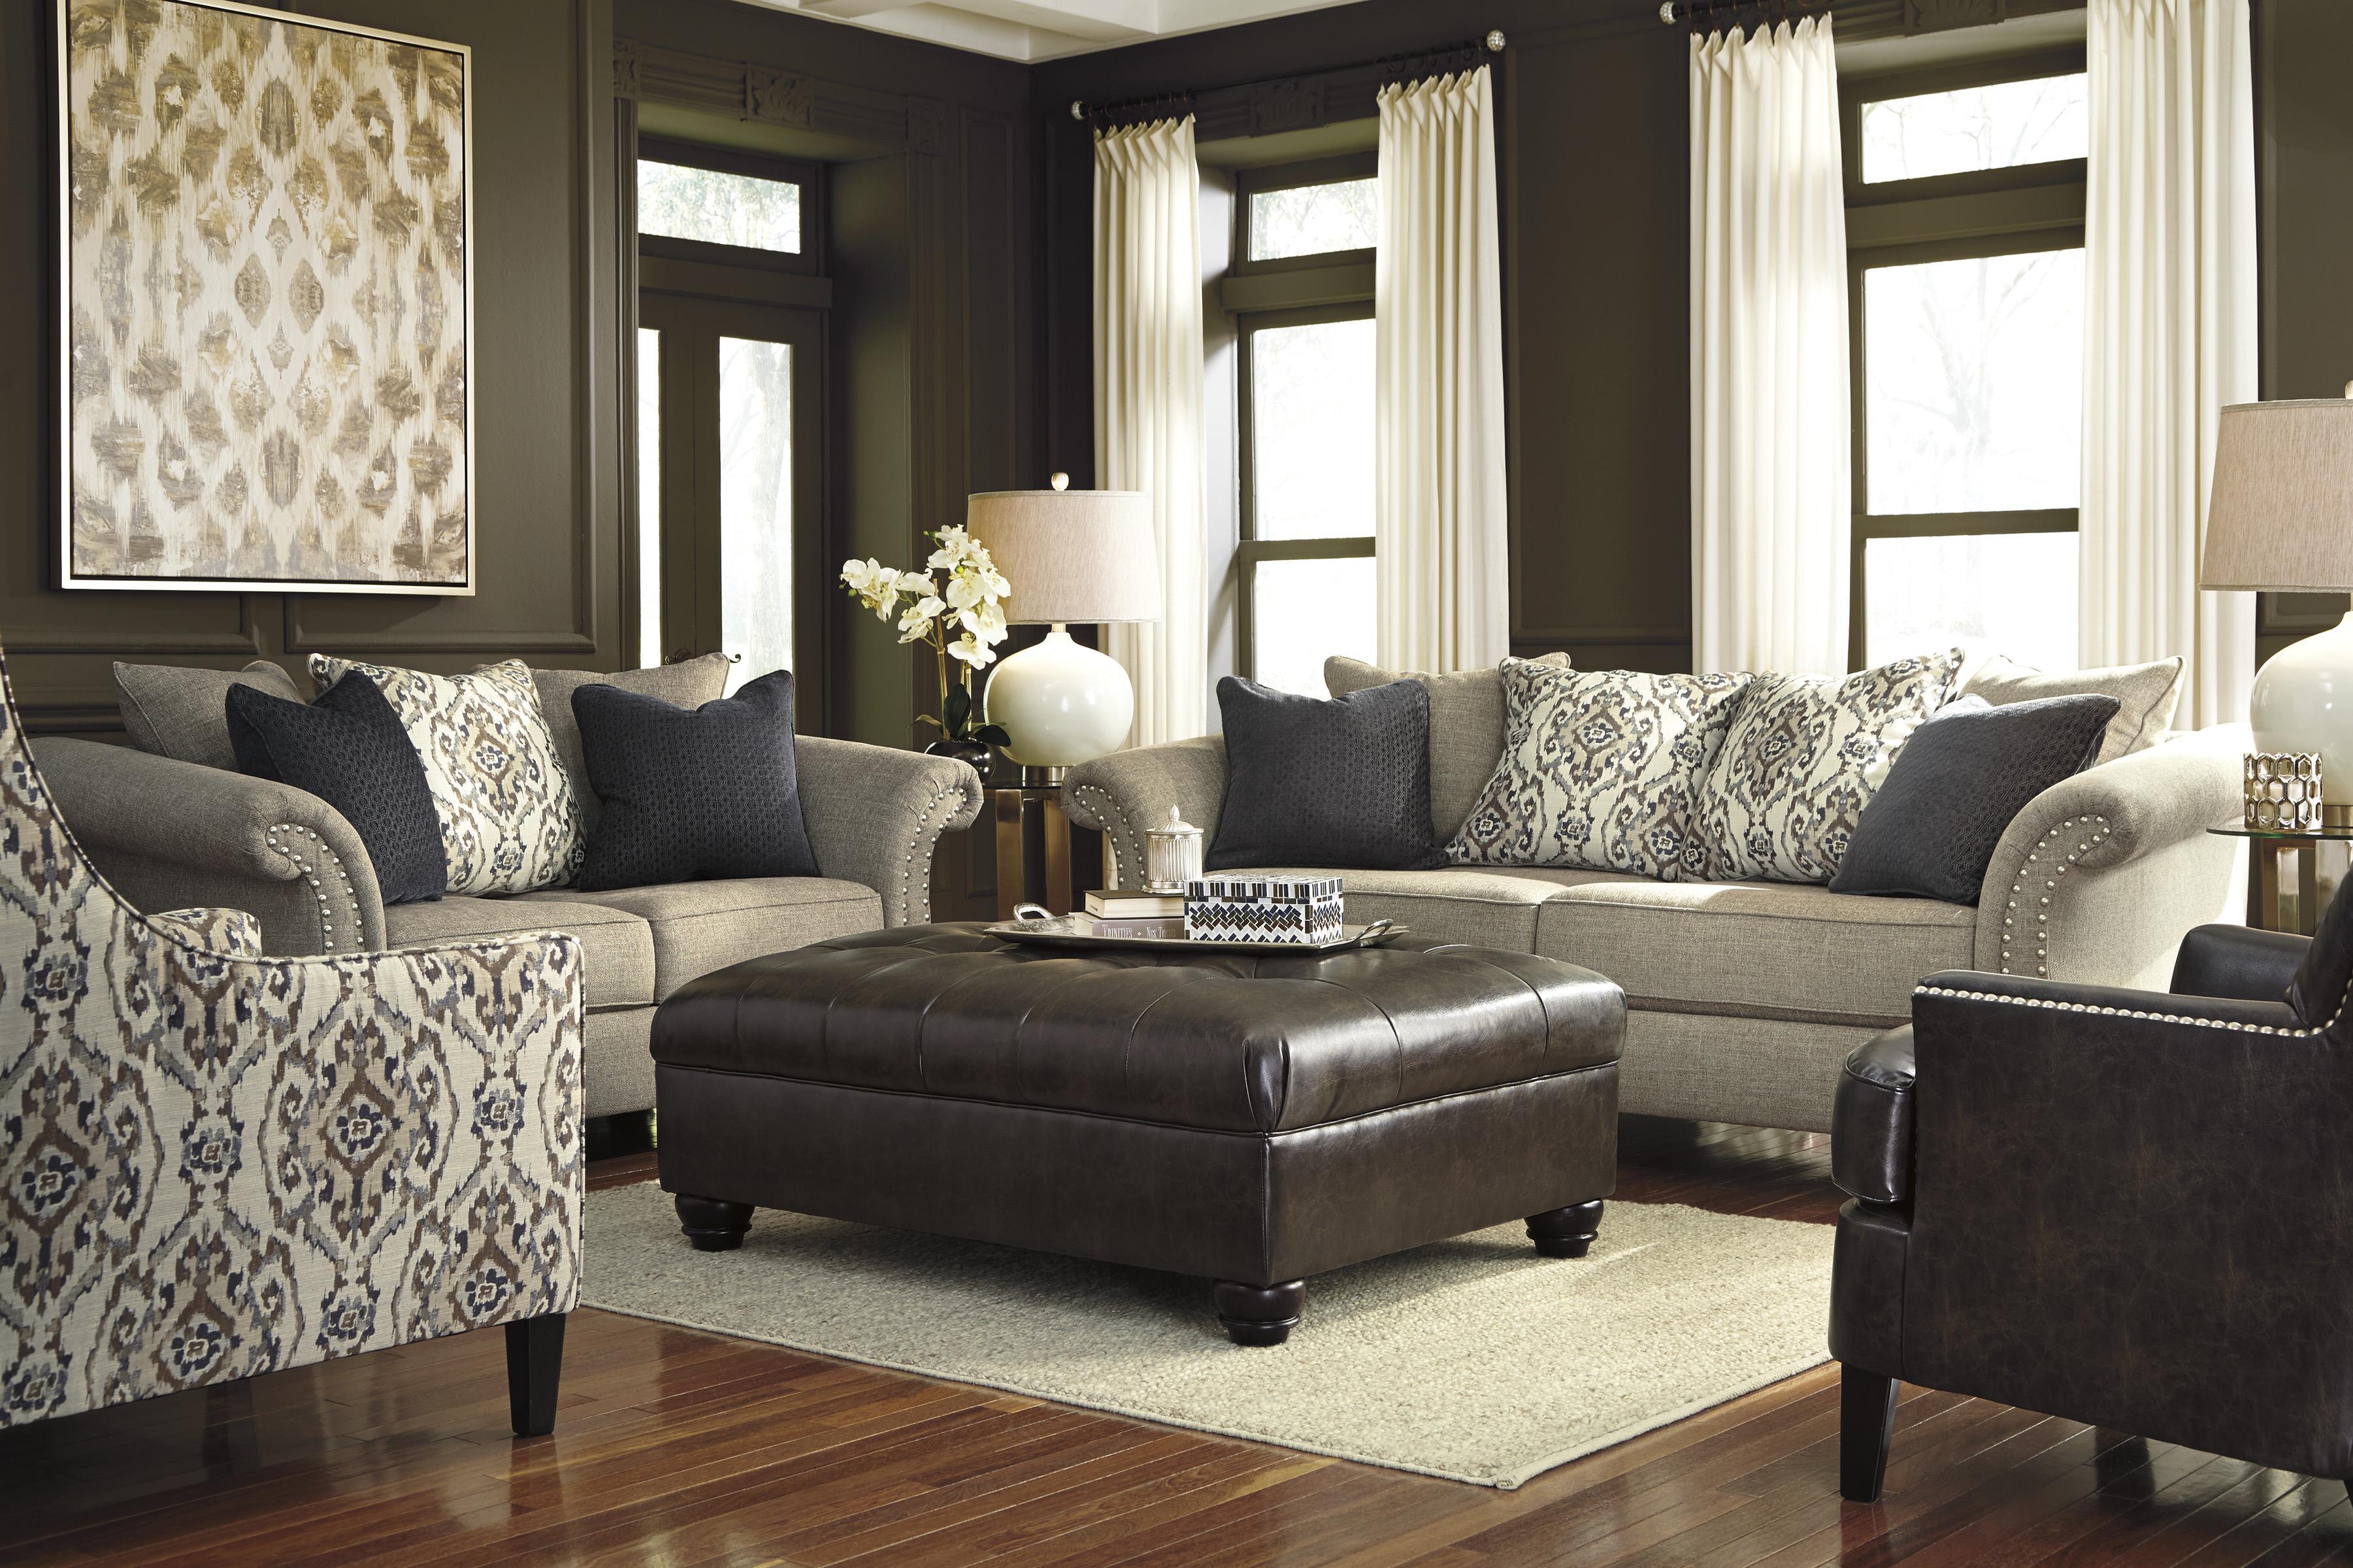 Ashley/Benchcraft Jonette Stationary Living Room Group - Item Number: 46101 Living Room Group 5